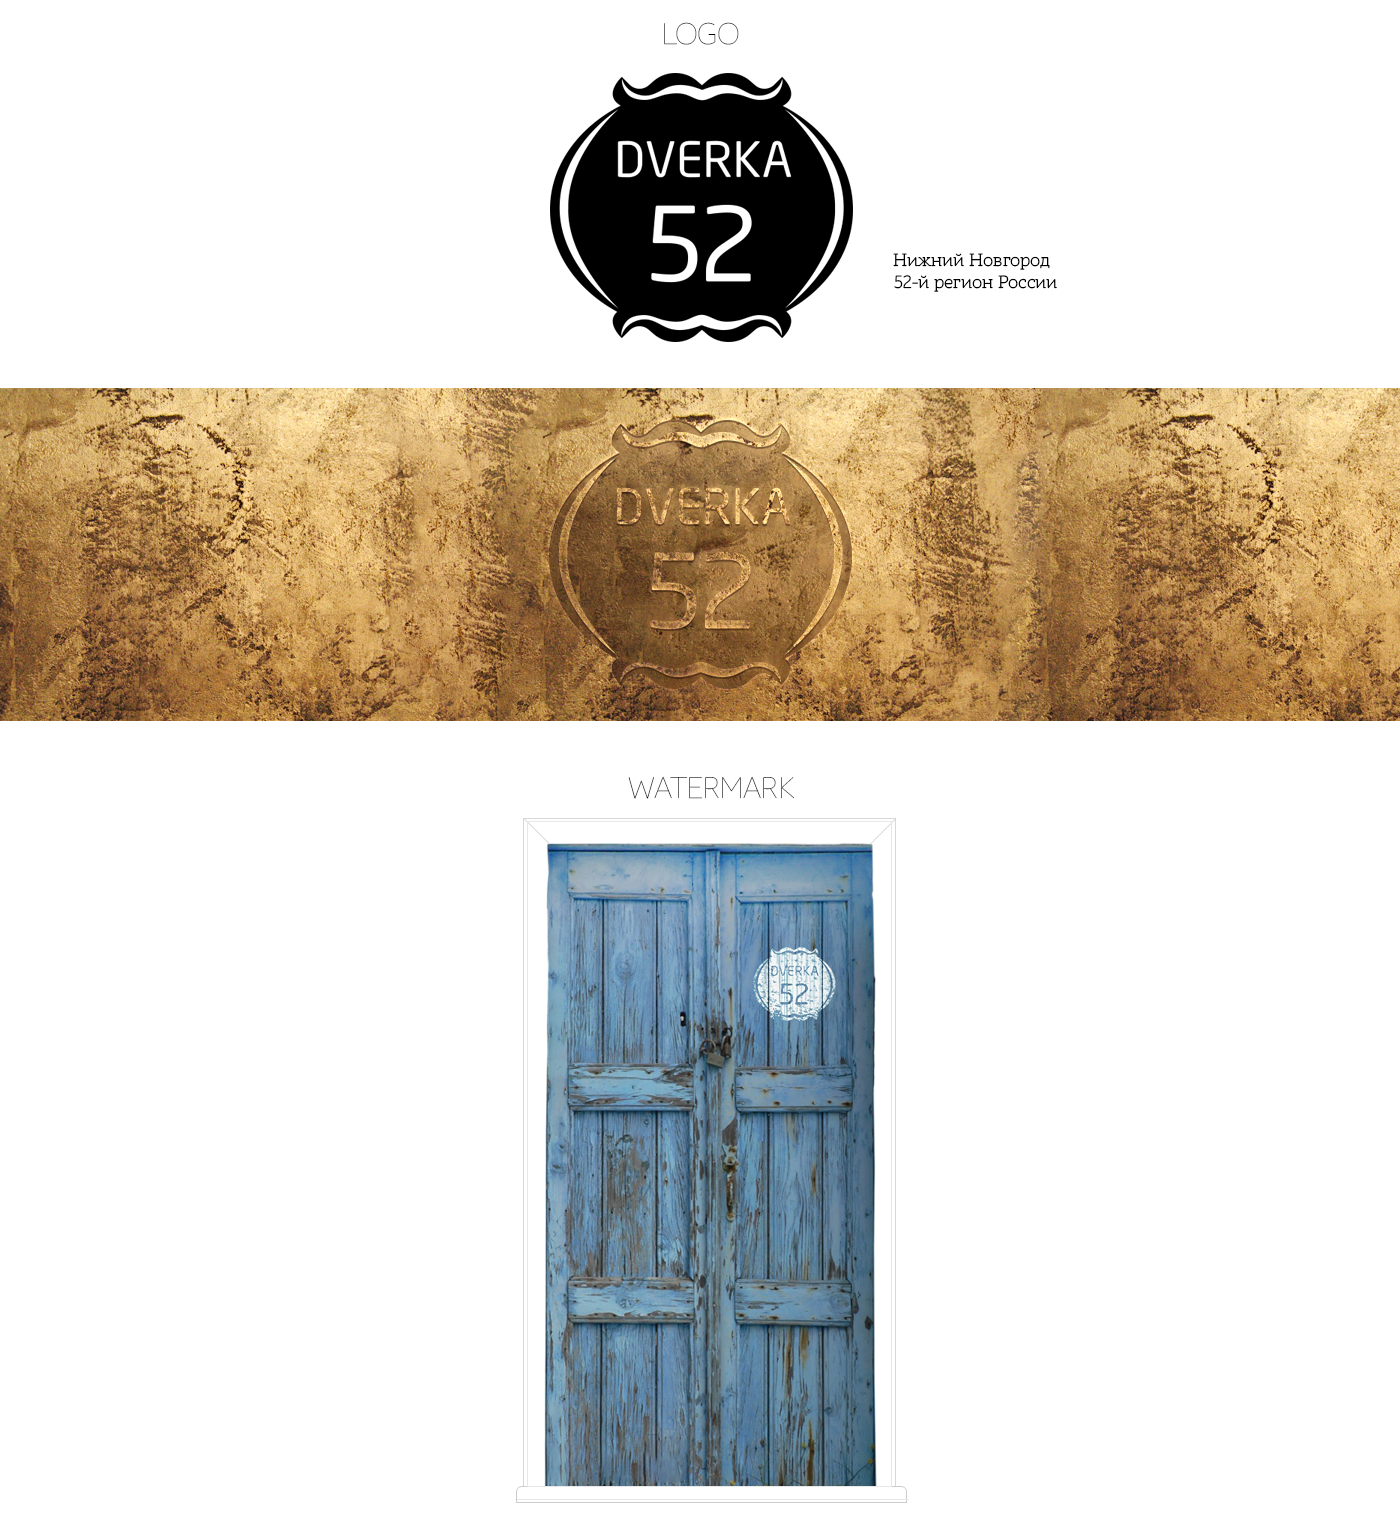 Дверка52